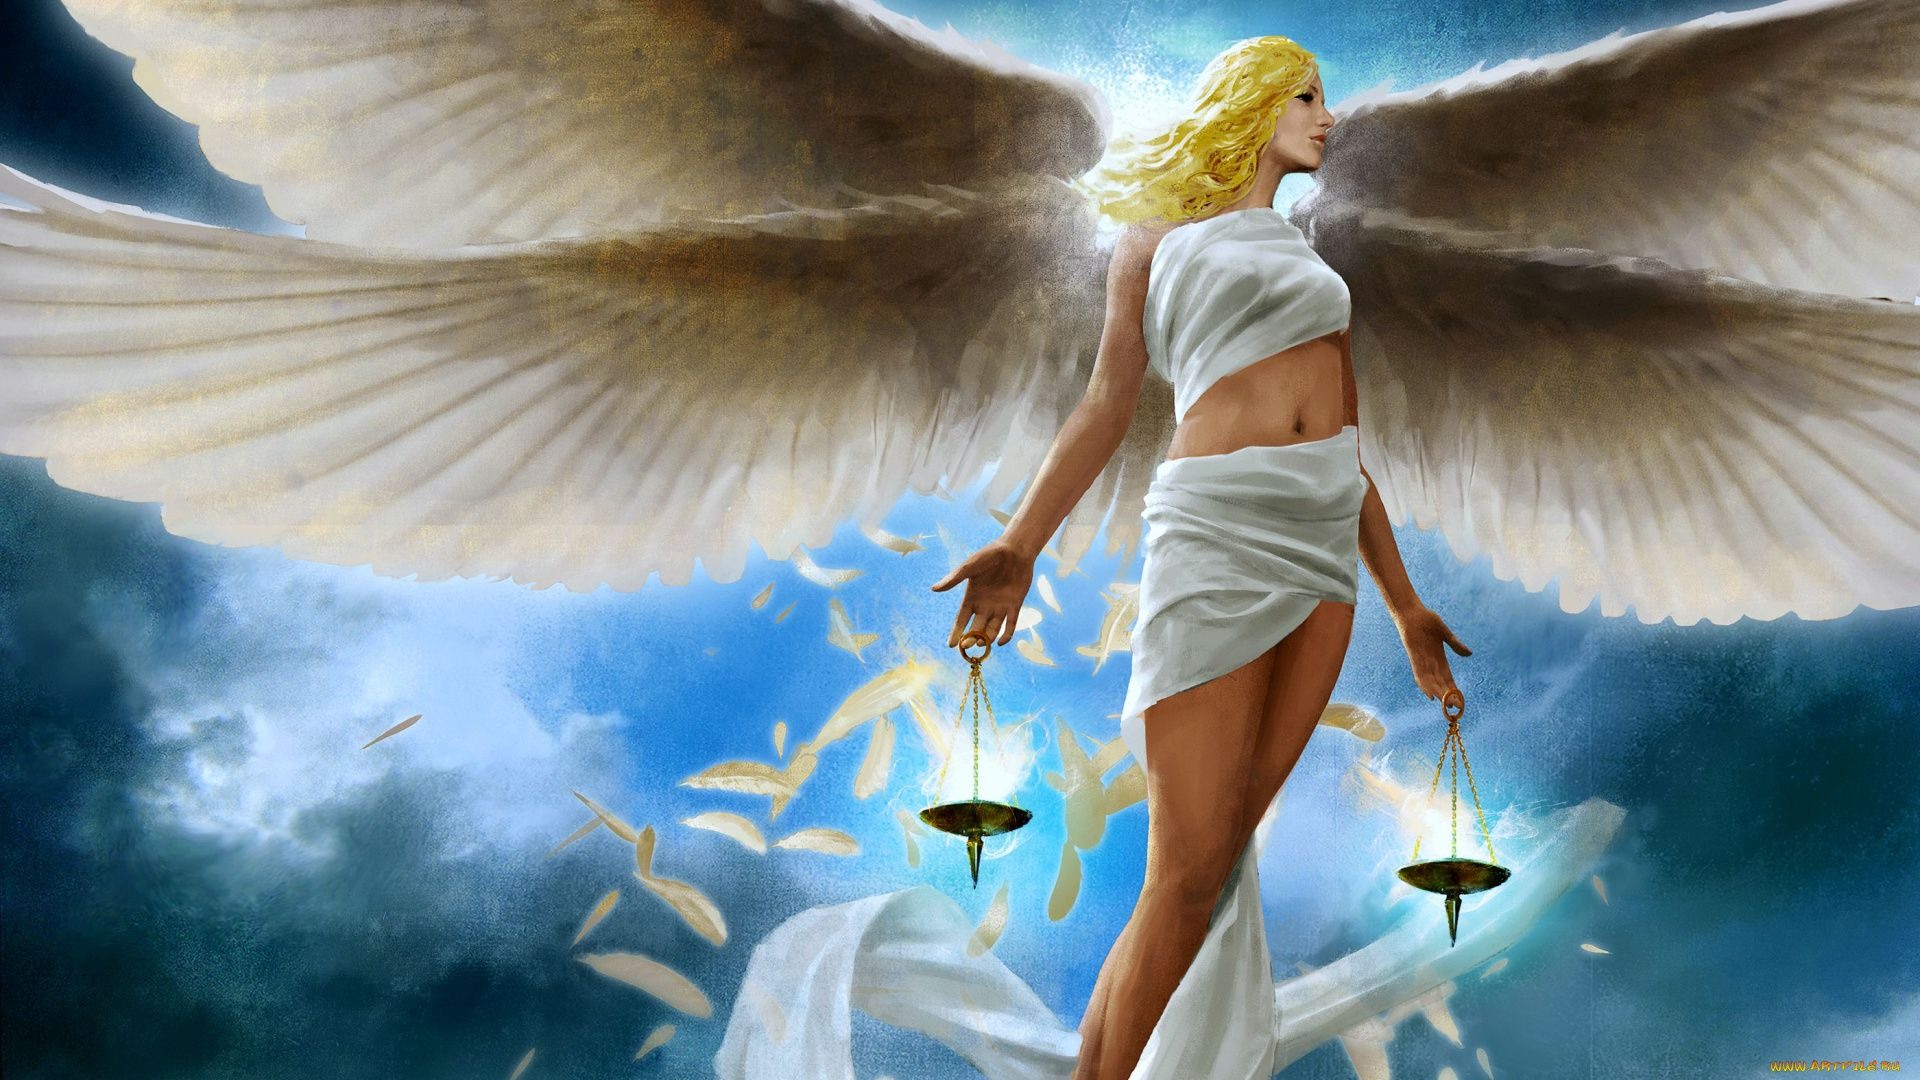 Wallpaper For Desktop Of Angels